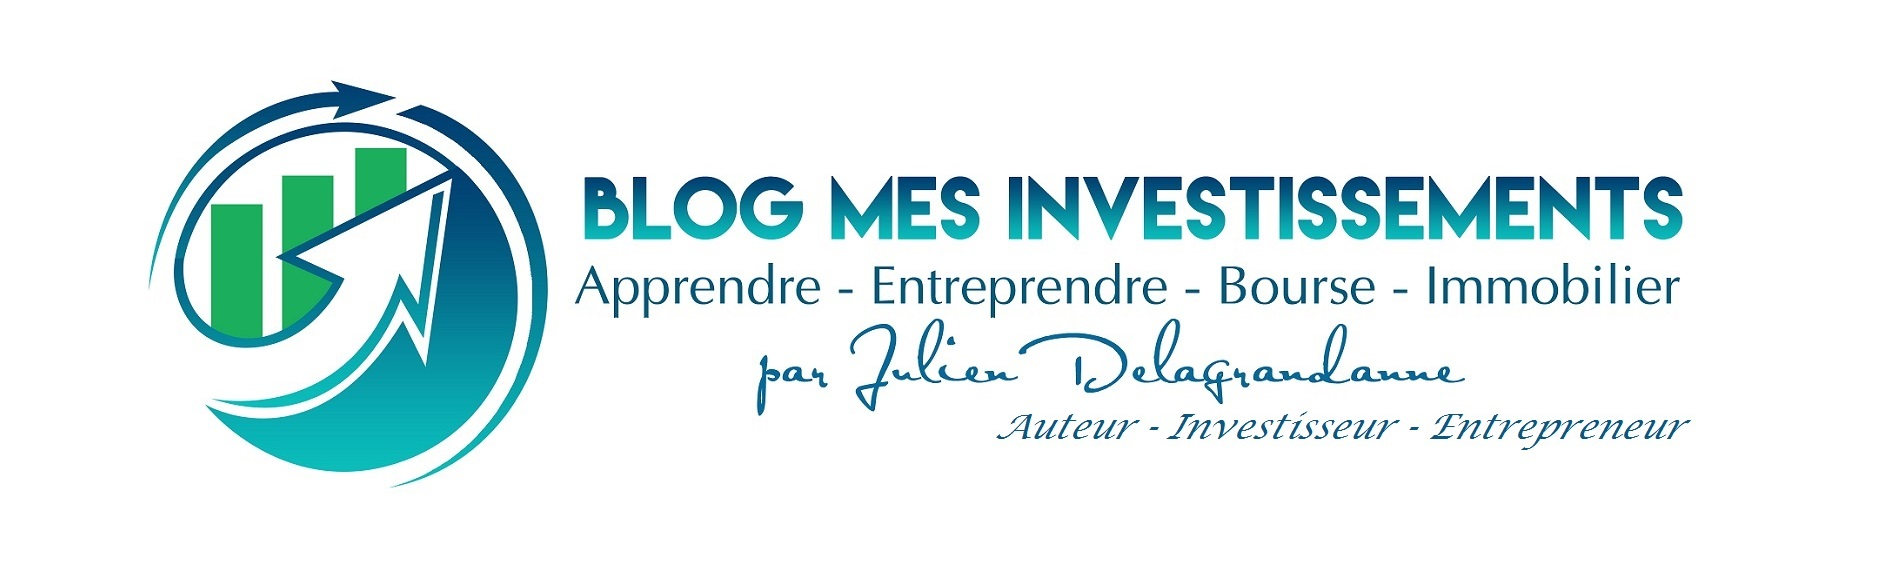 Blog Mes Investissements Logo